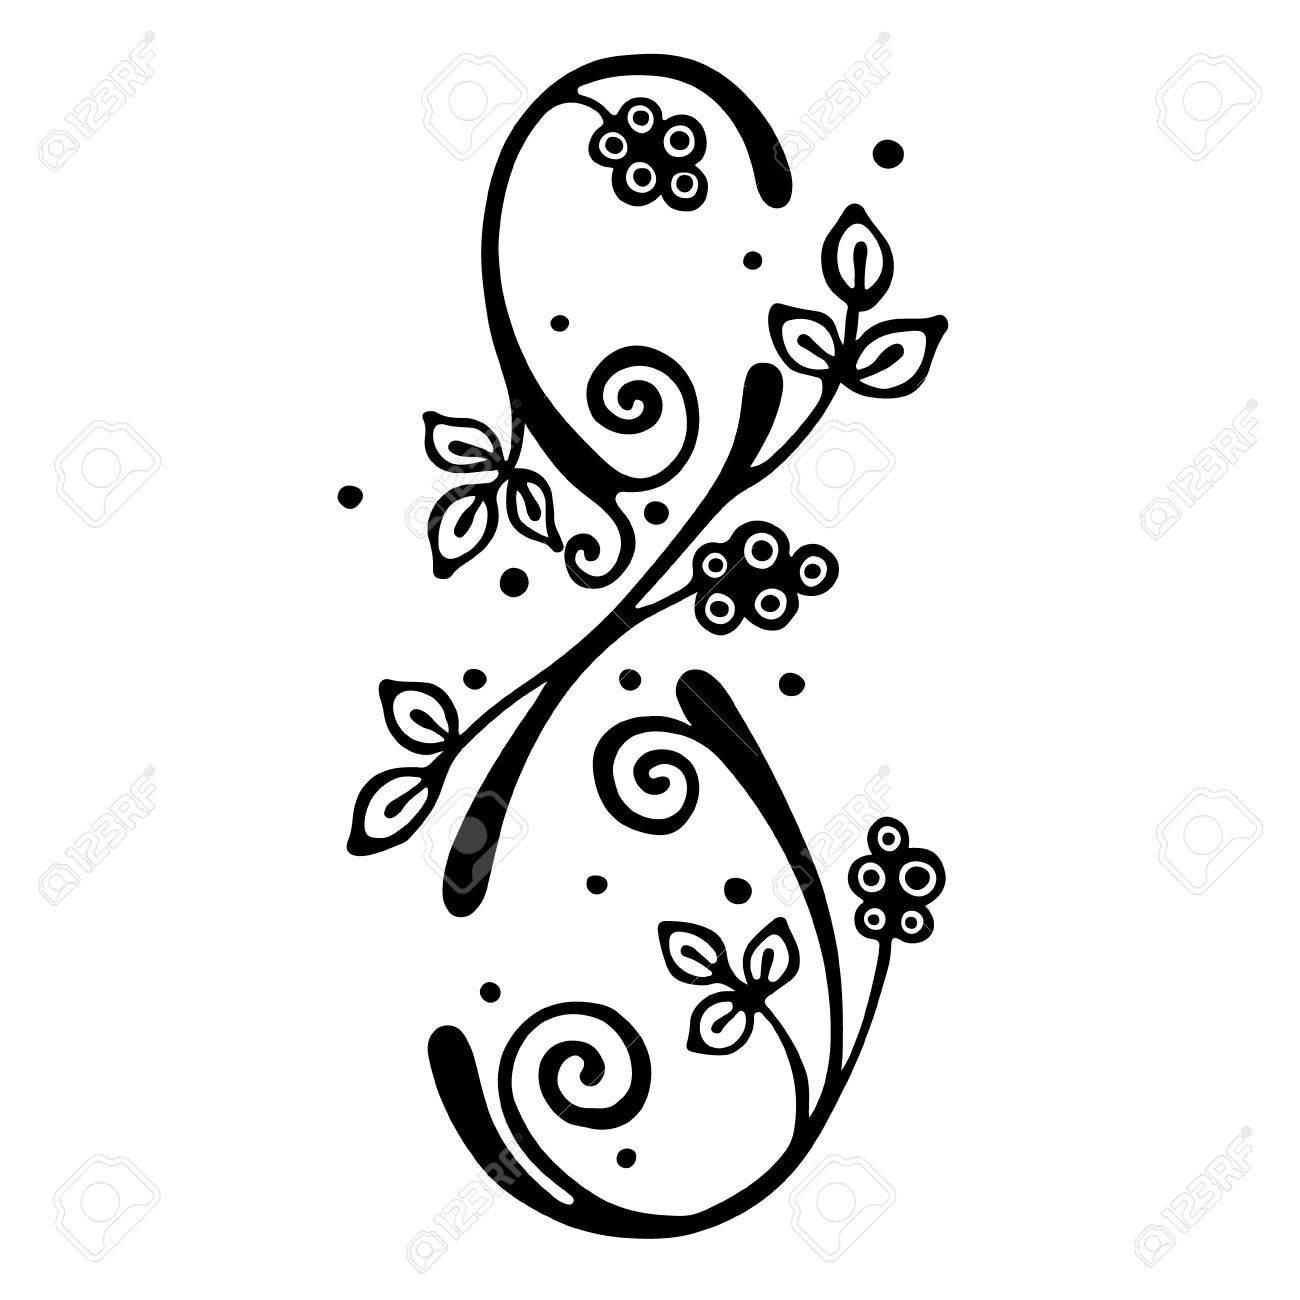 Vector Ilustracao Desenhada A Mao Numero Estilizado Decorativo